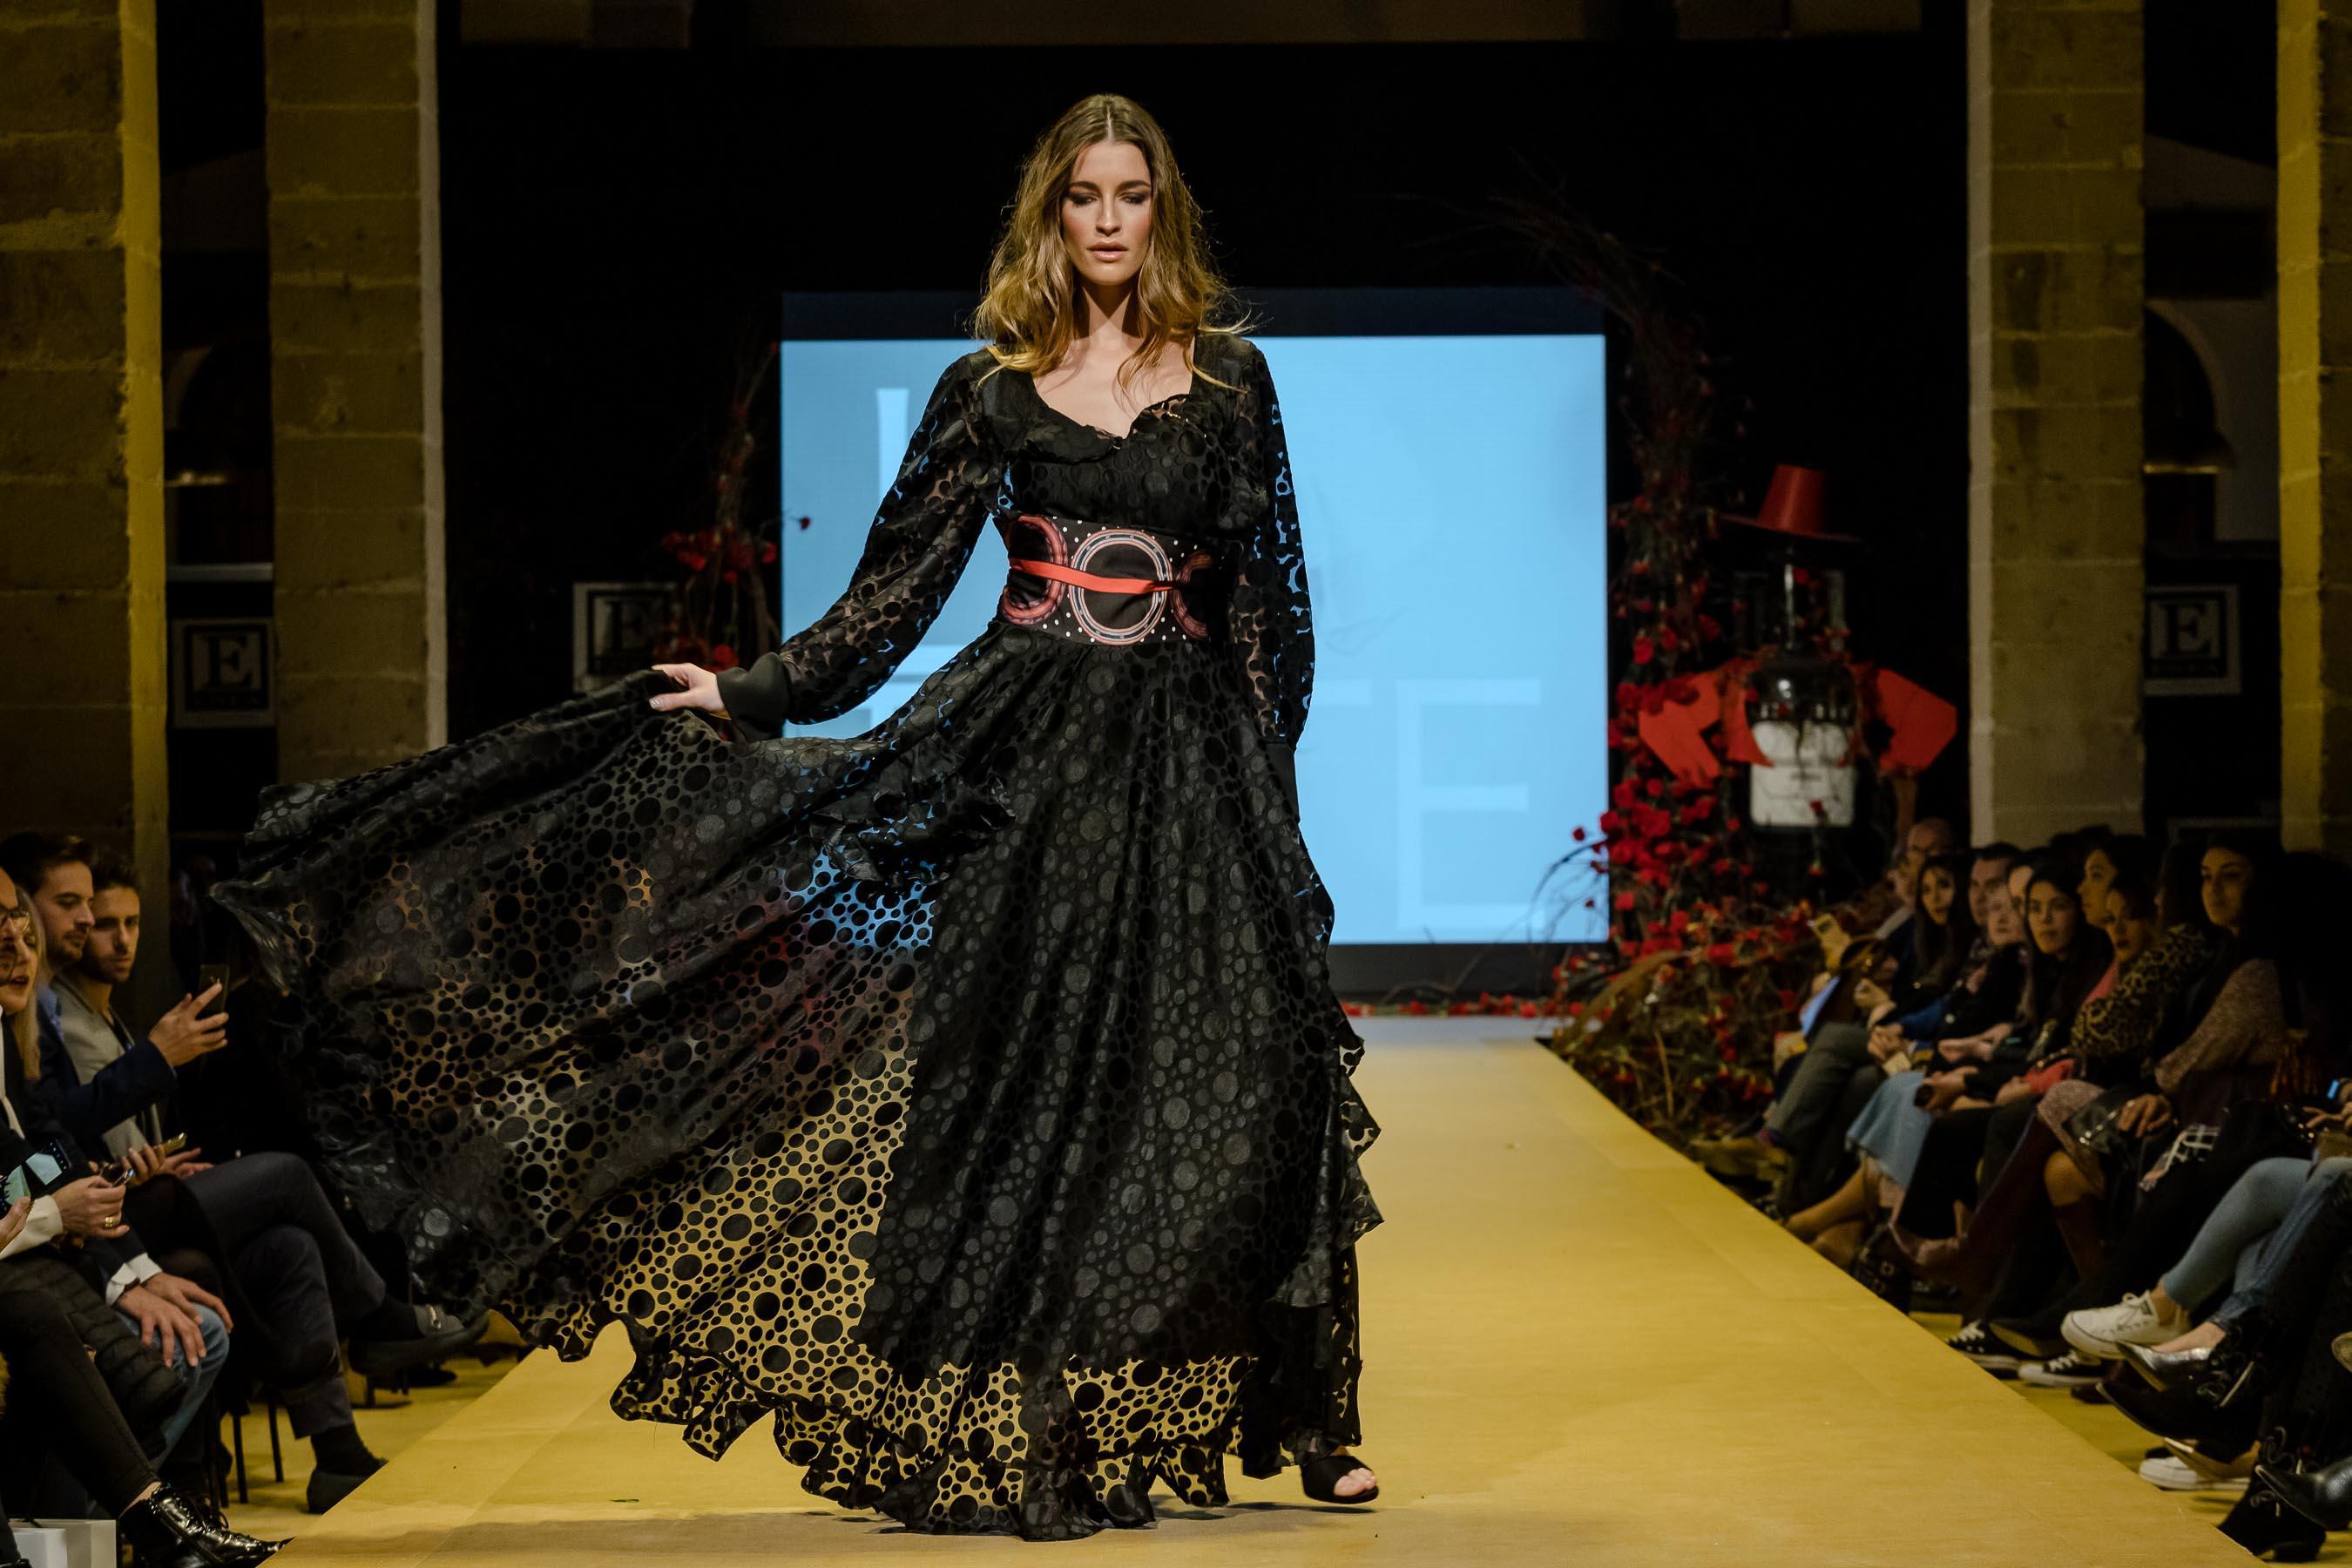 La 'mística' flamenca de La Tate